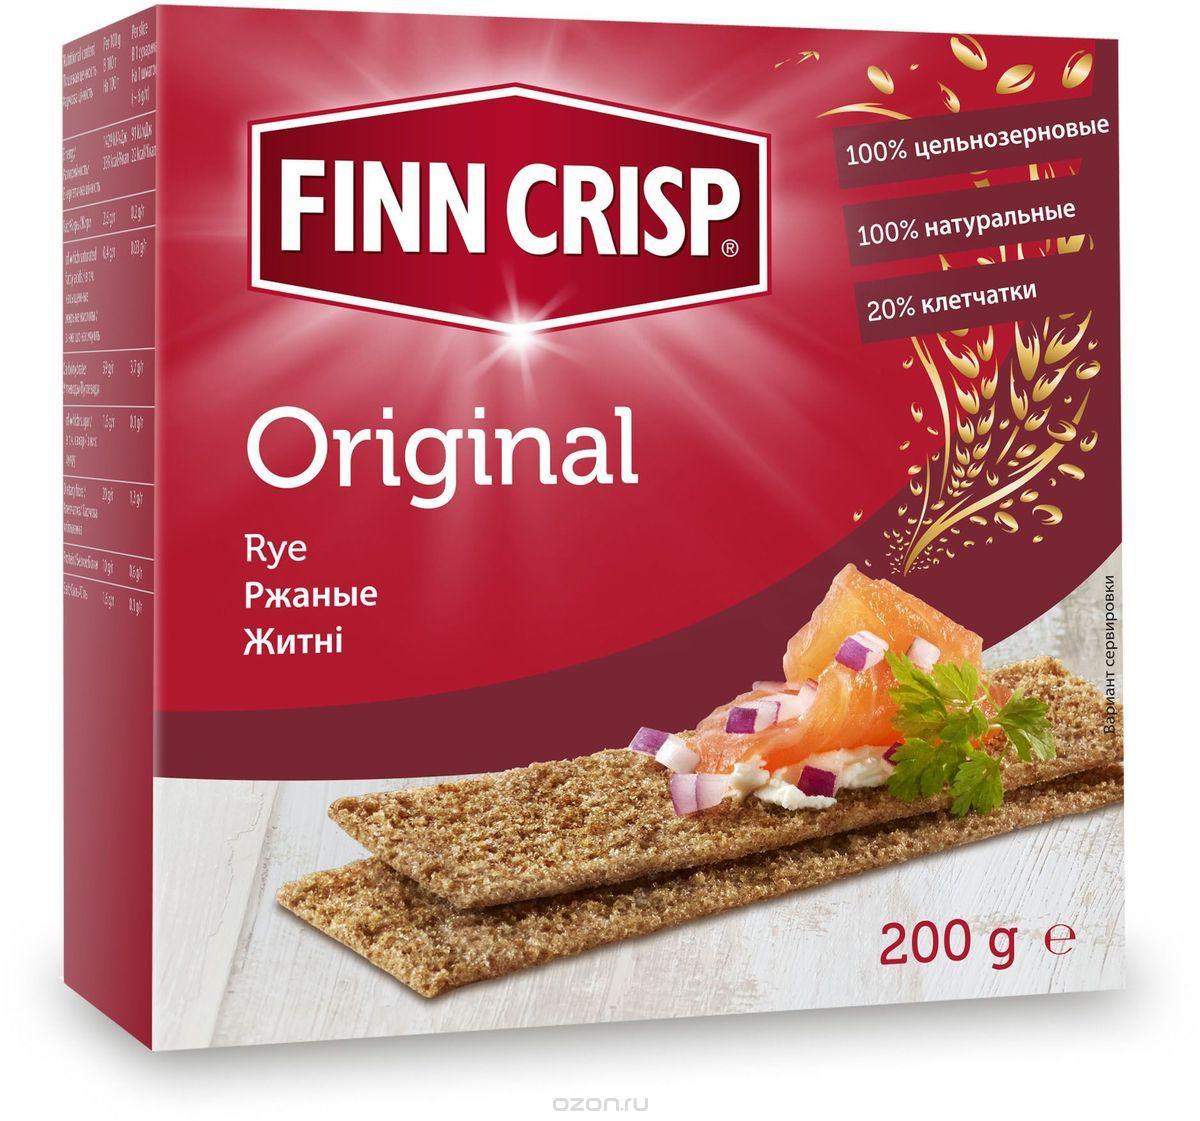 Finn Crisp Original хлебцы ржаные, 200 г